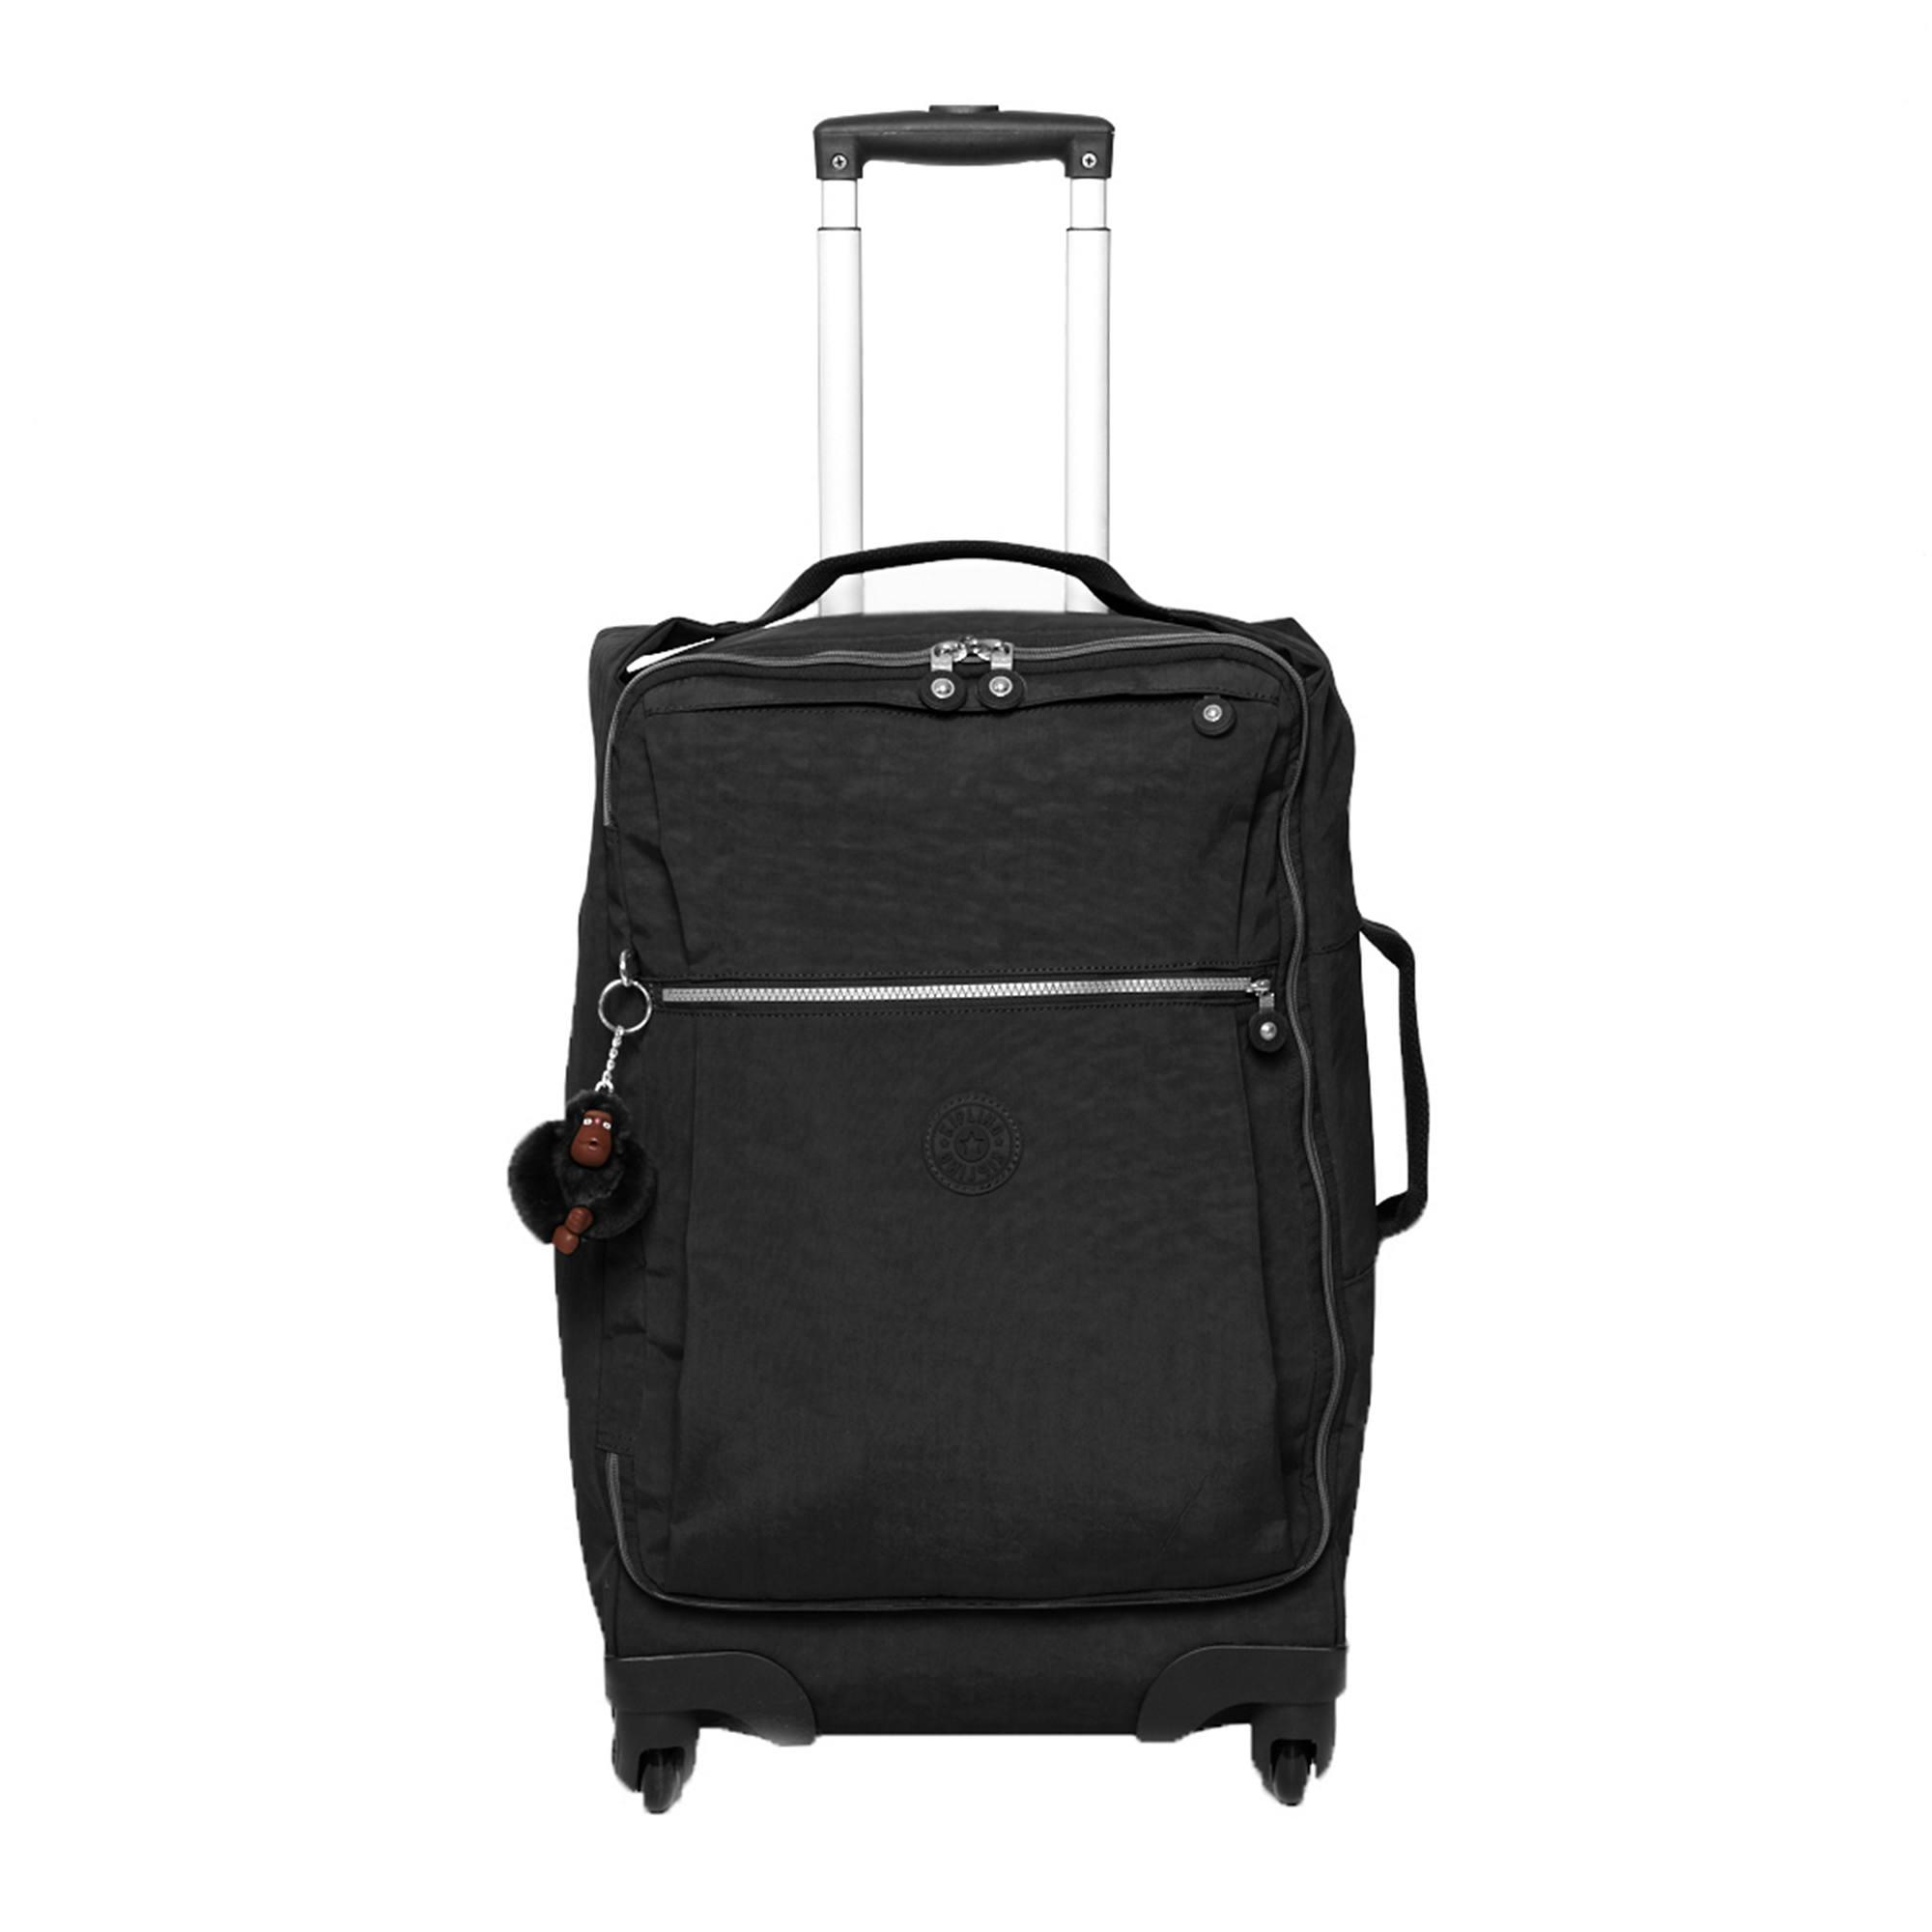 Kipling Darcey Small Metallic Carry-On Rolling Luggage